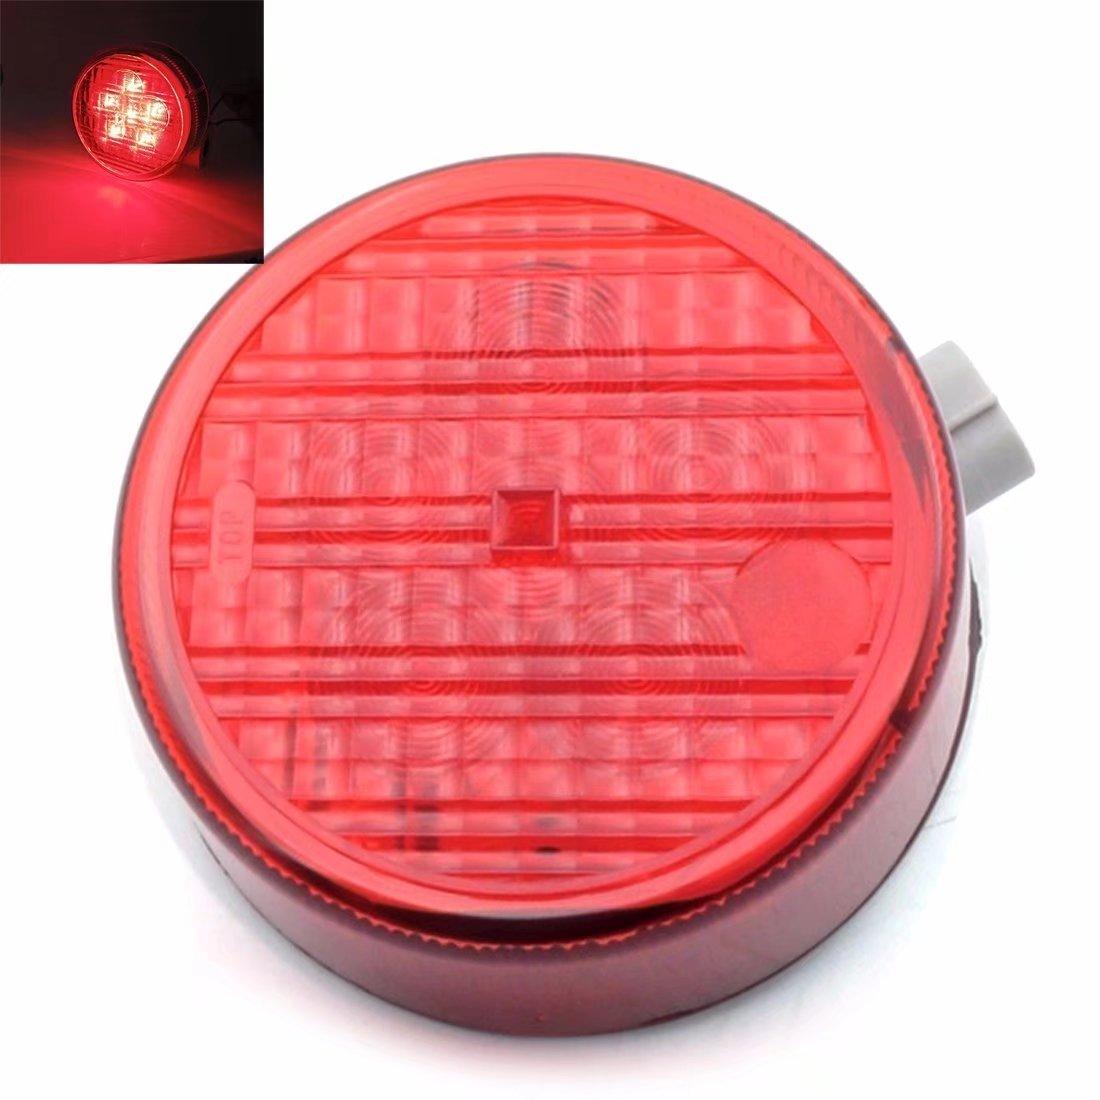 Amazon.com: Paddsun LED Tail Light Rear Lamp Replacement For Kawasaki Teryx Teryx4 2012 2013 2014 2015 2016 (red): Automotive